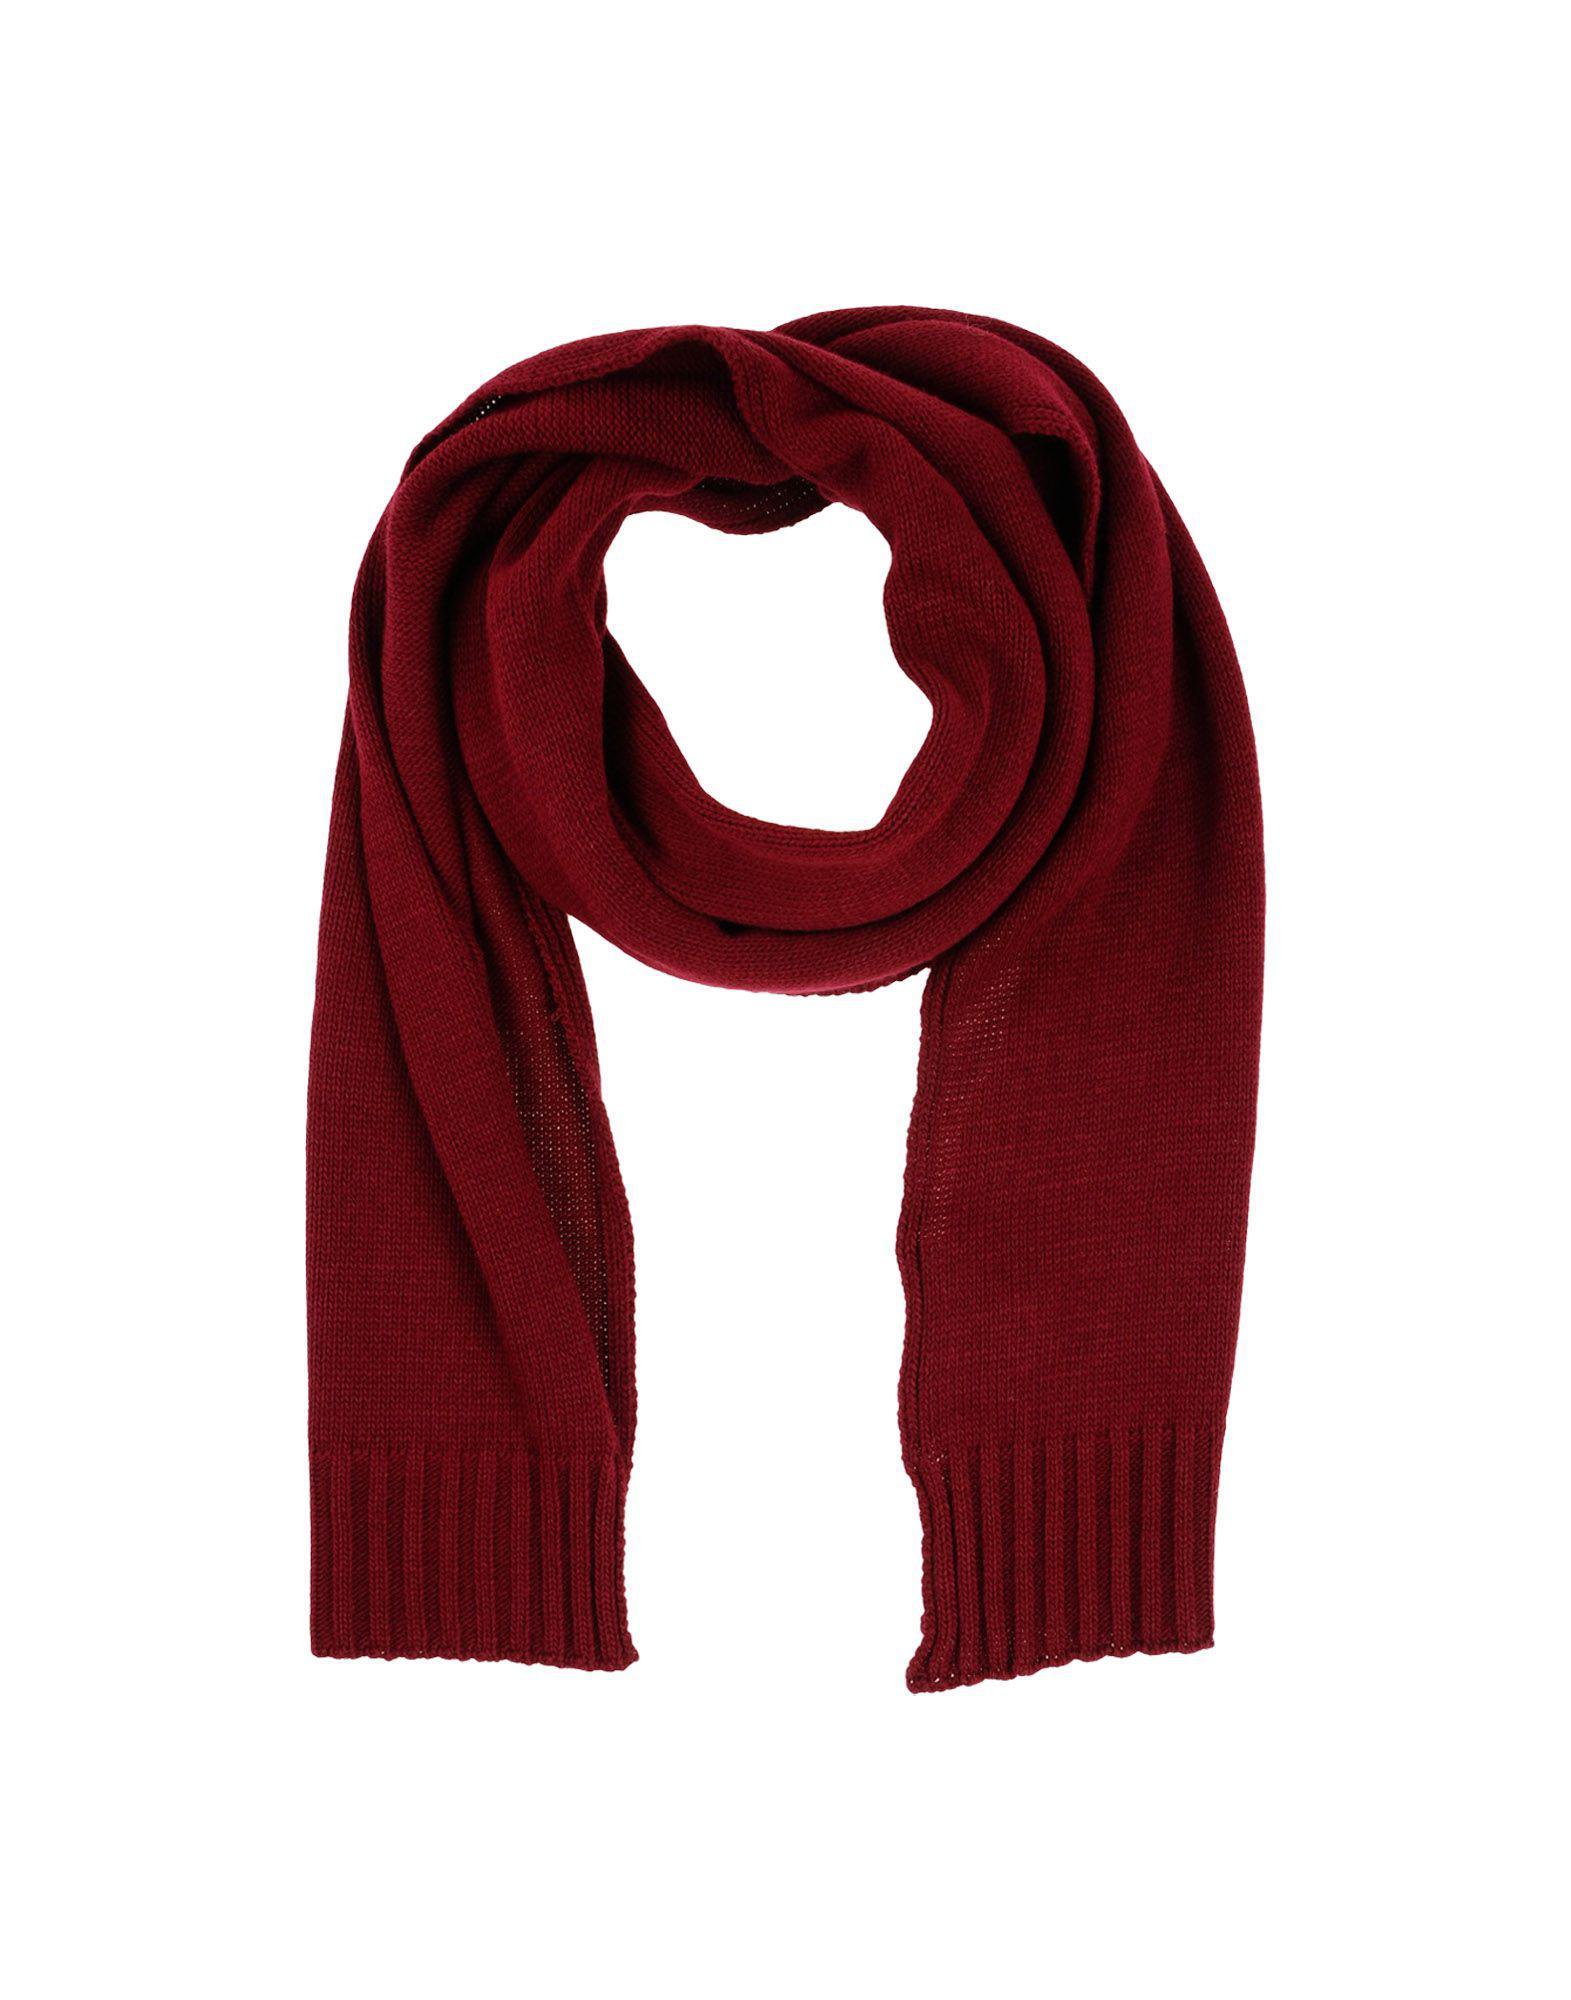 ACCESSORIES - Oblong scarves Kaos JdA0RkG